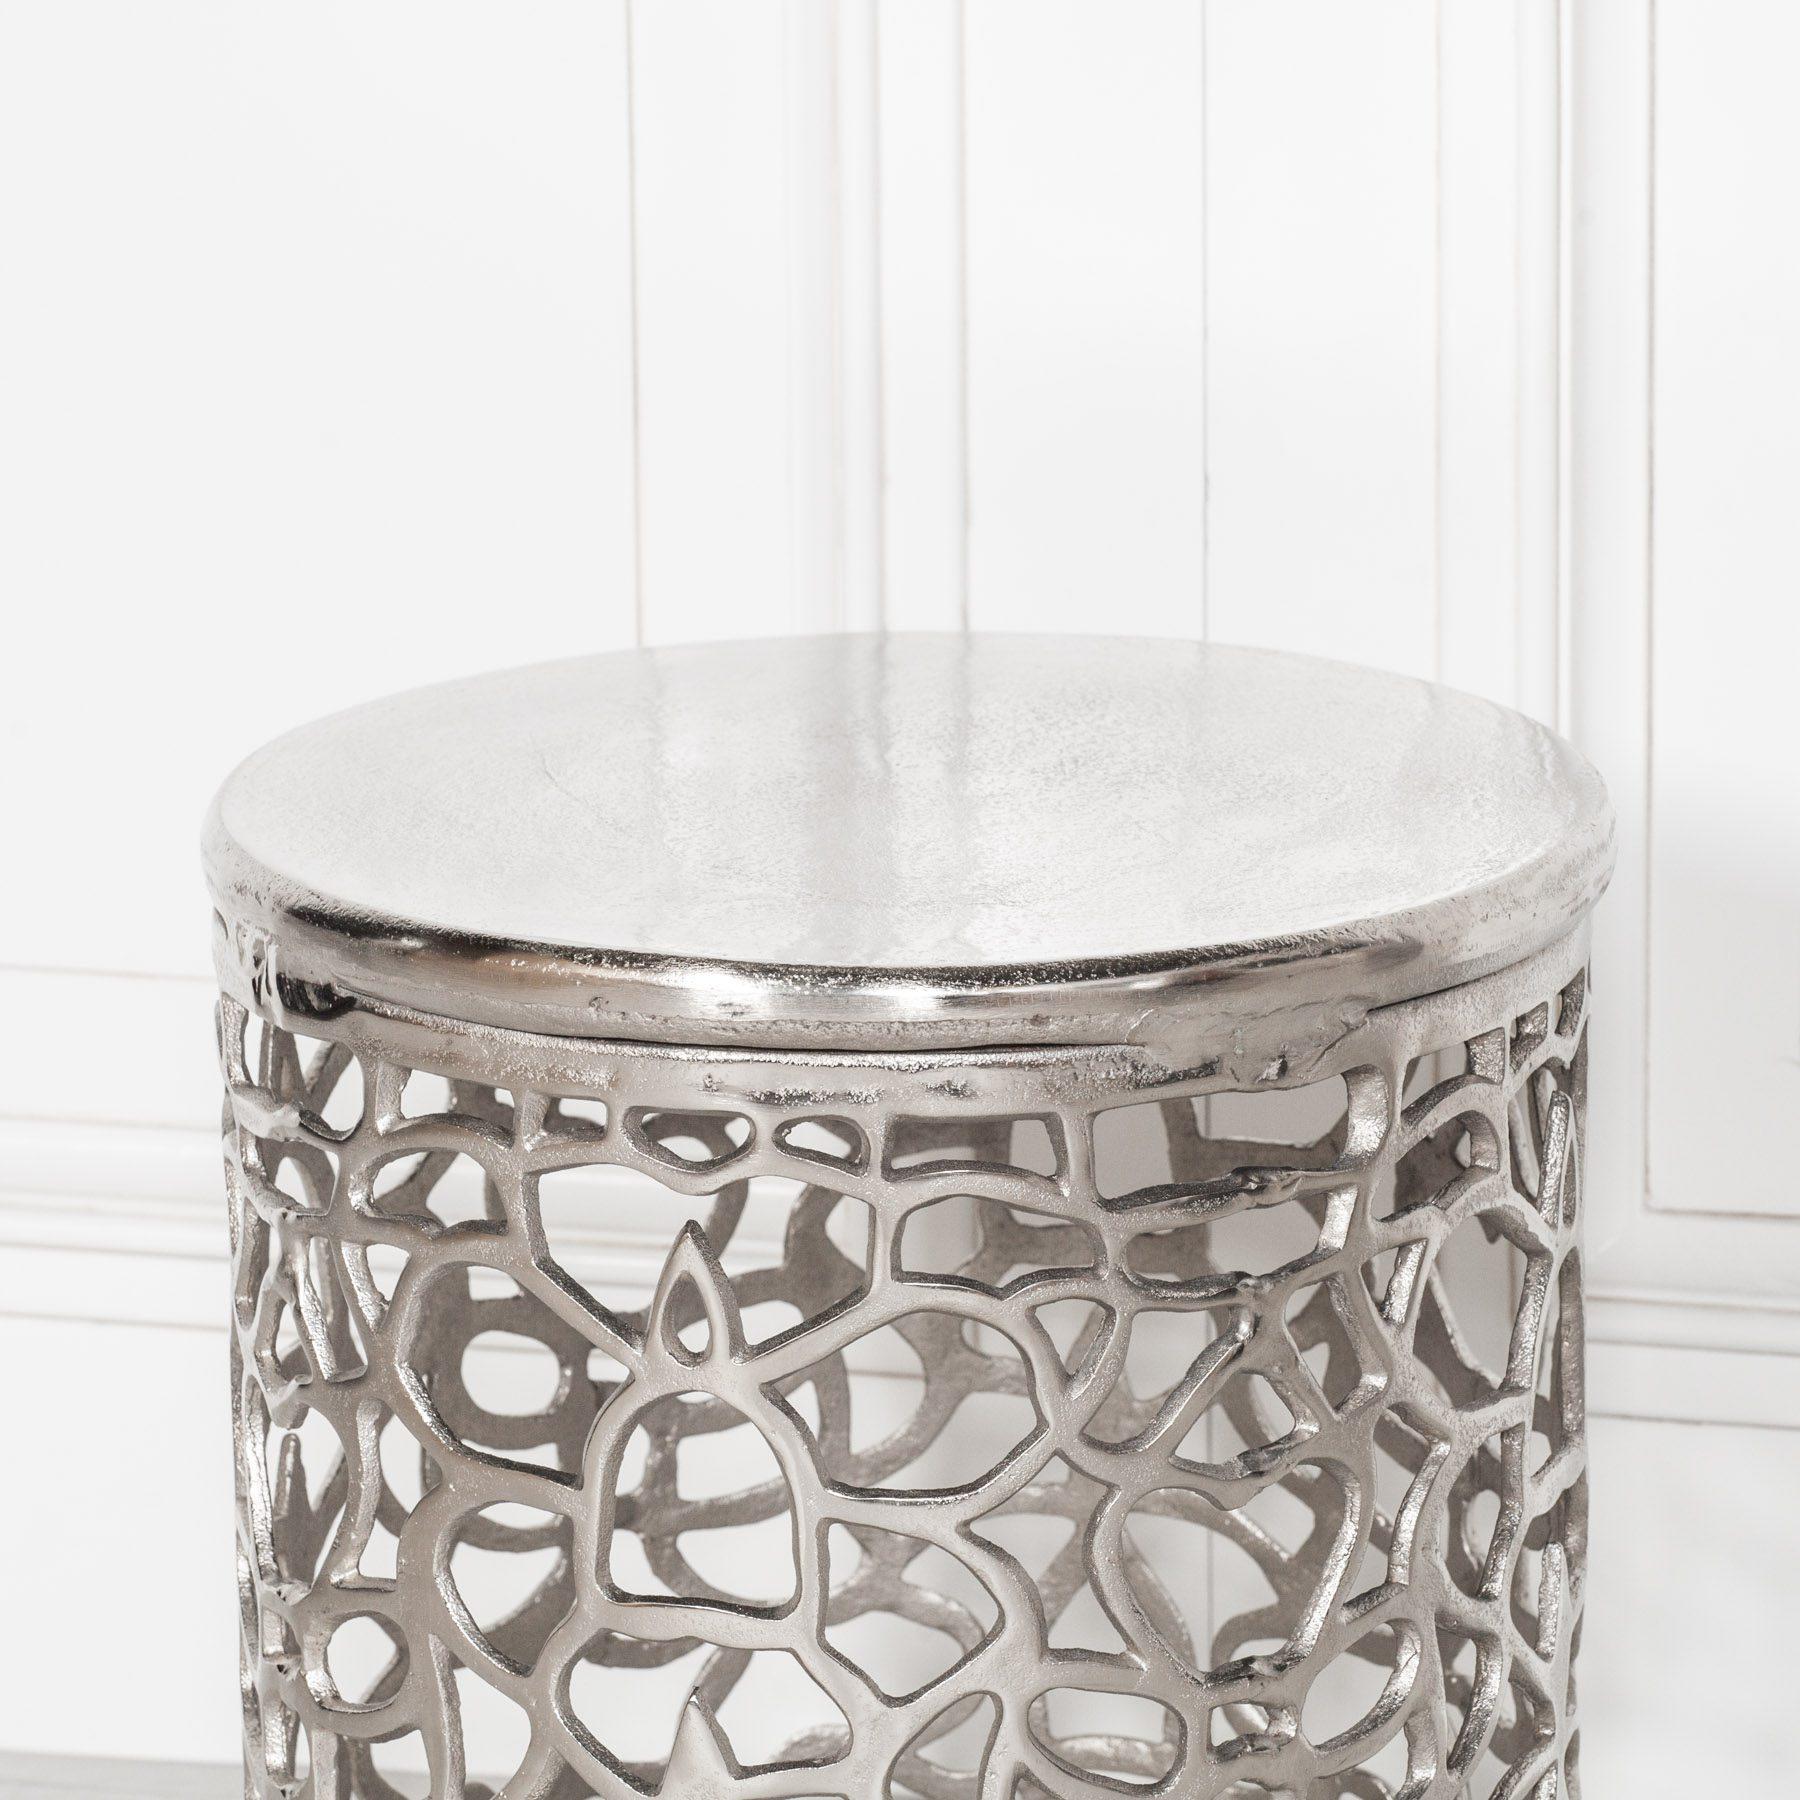 Aluminium Fretwork Side Table